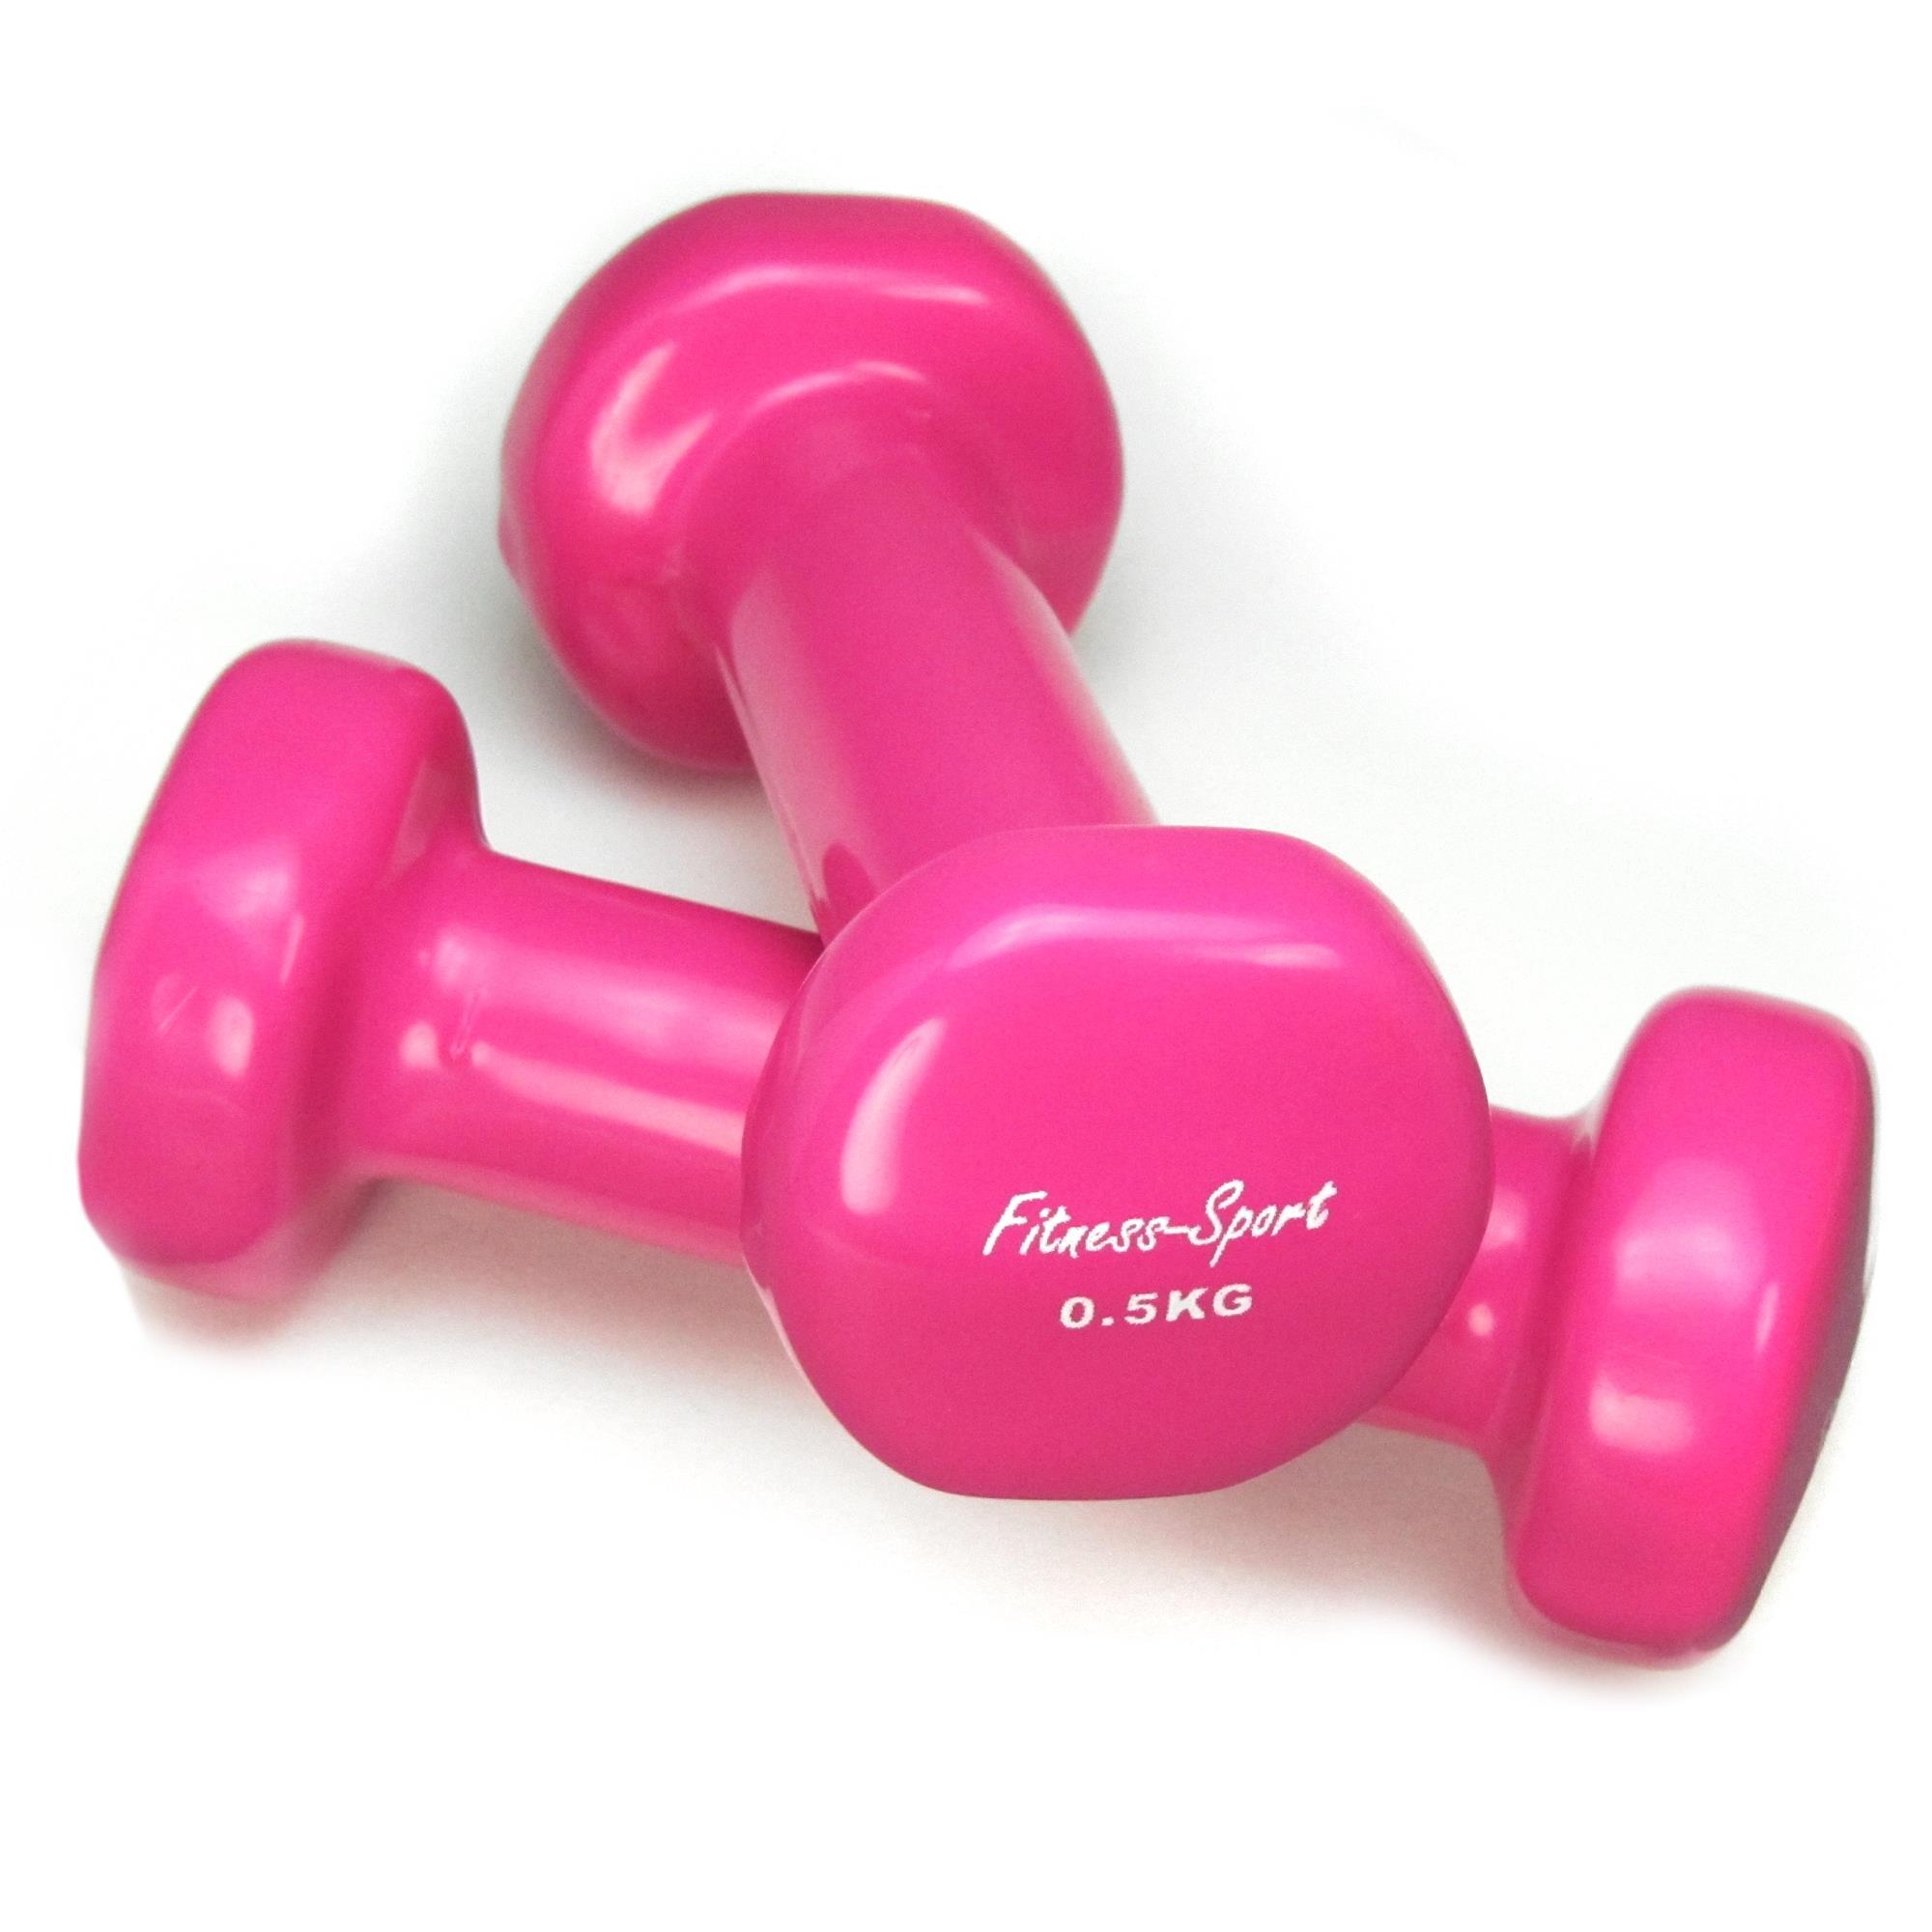 2x kurzhanteln hanteln hantel set vinyl 0 5 5 kg fitness aerobic training ebay. Black Bedroom Furniture Sets. Home Design Ideas